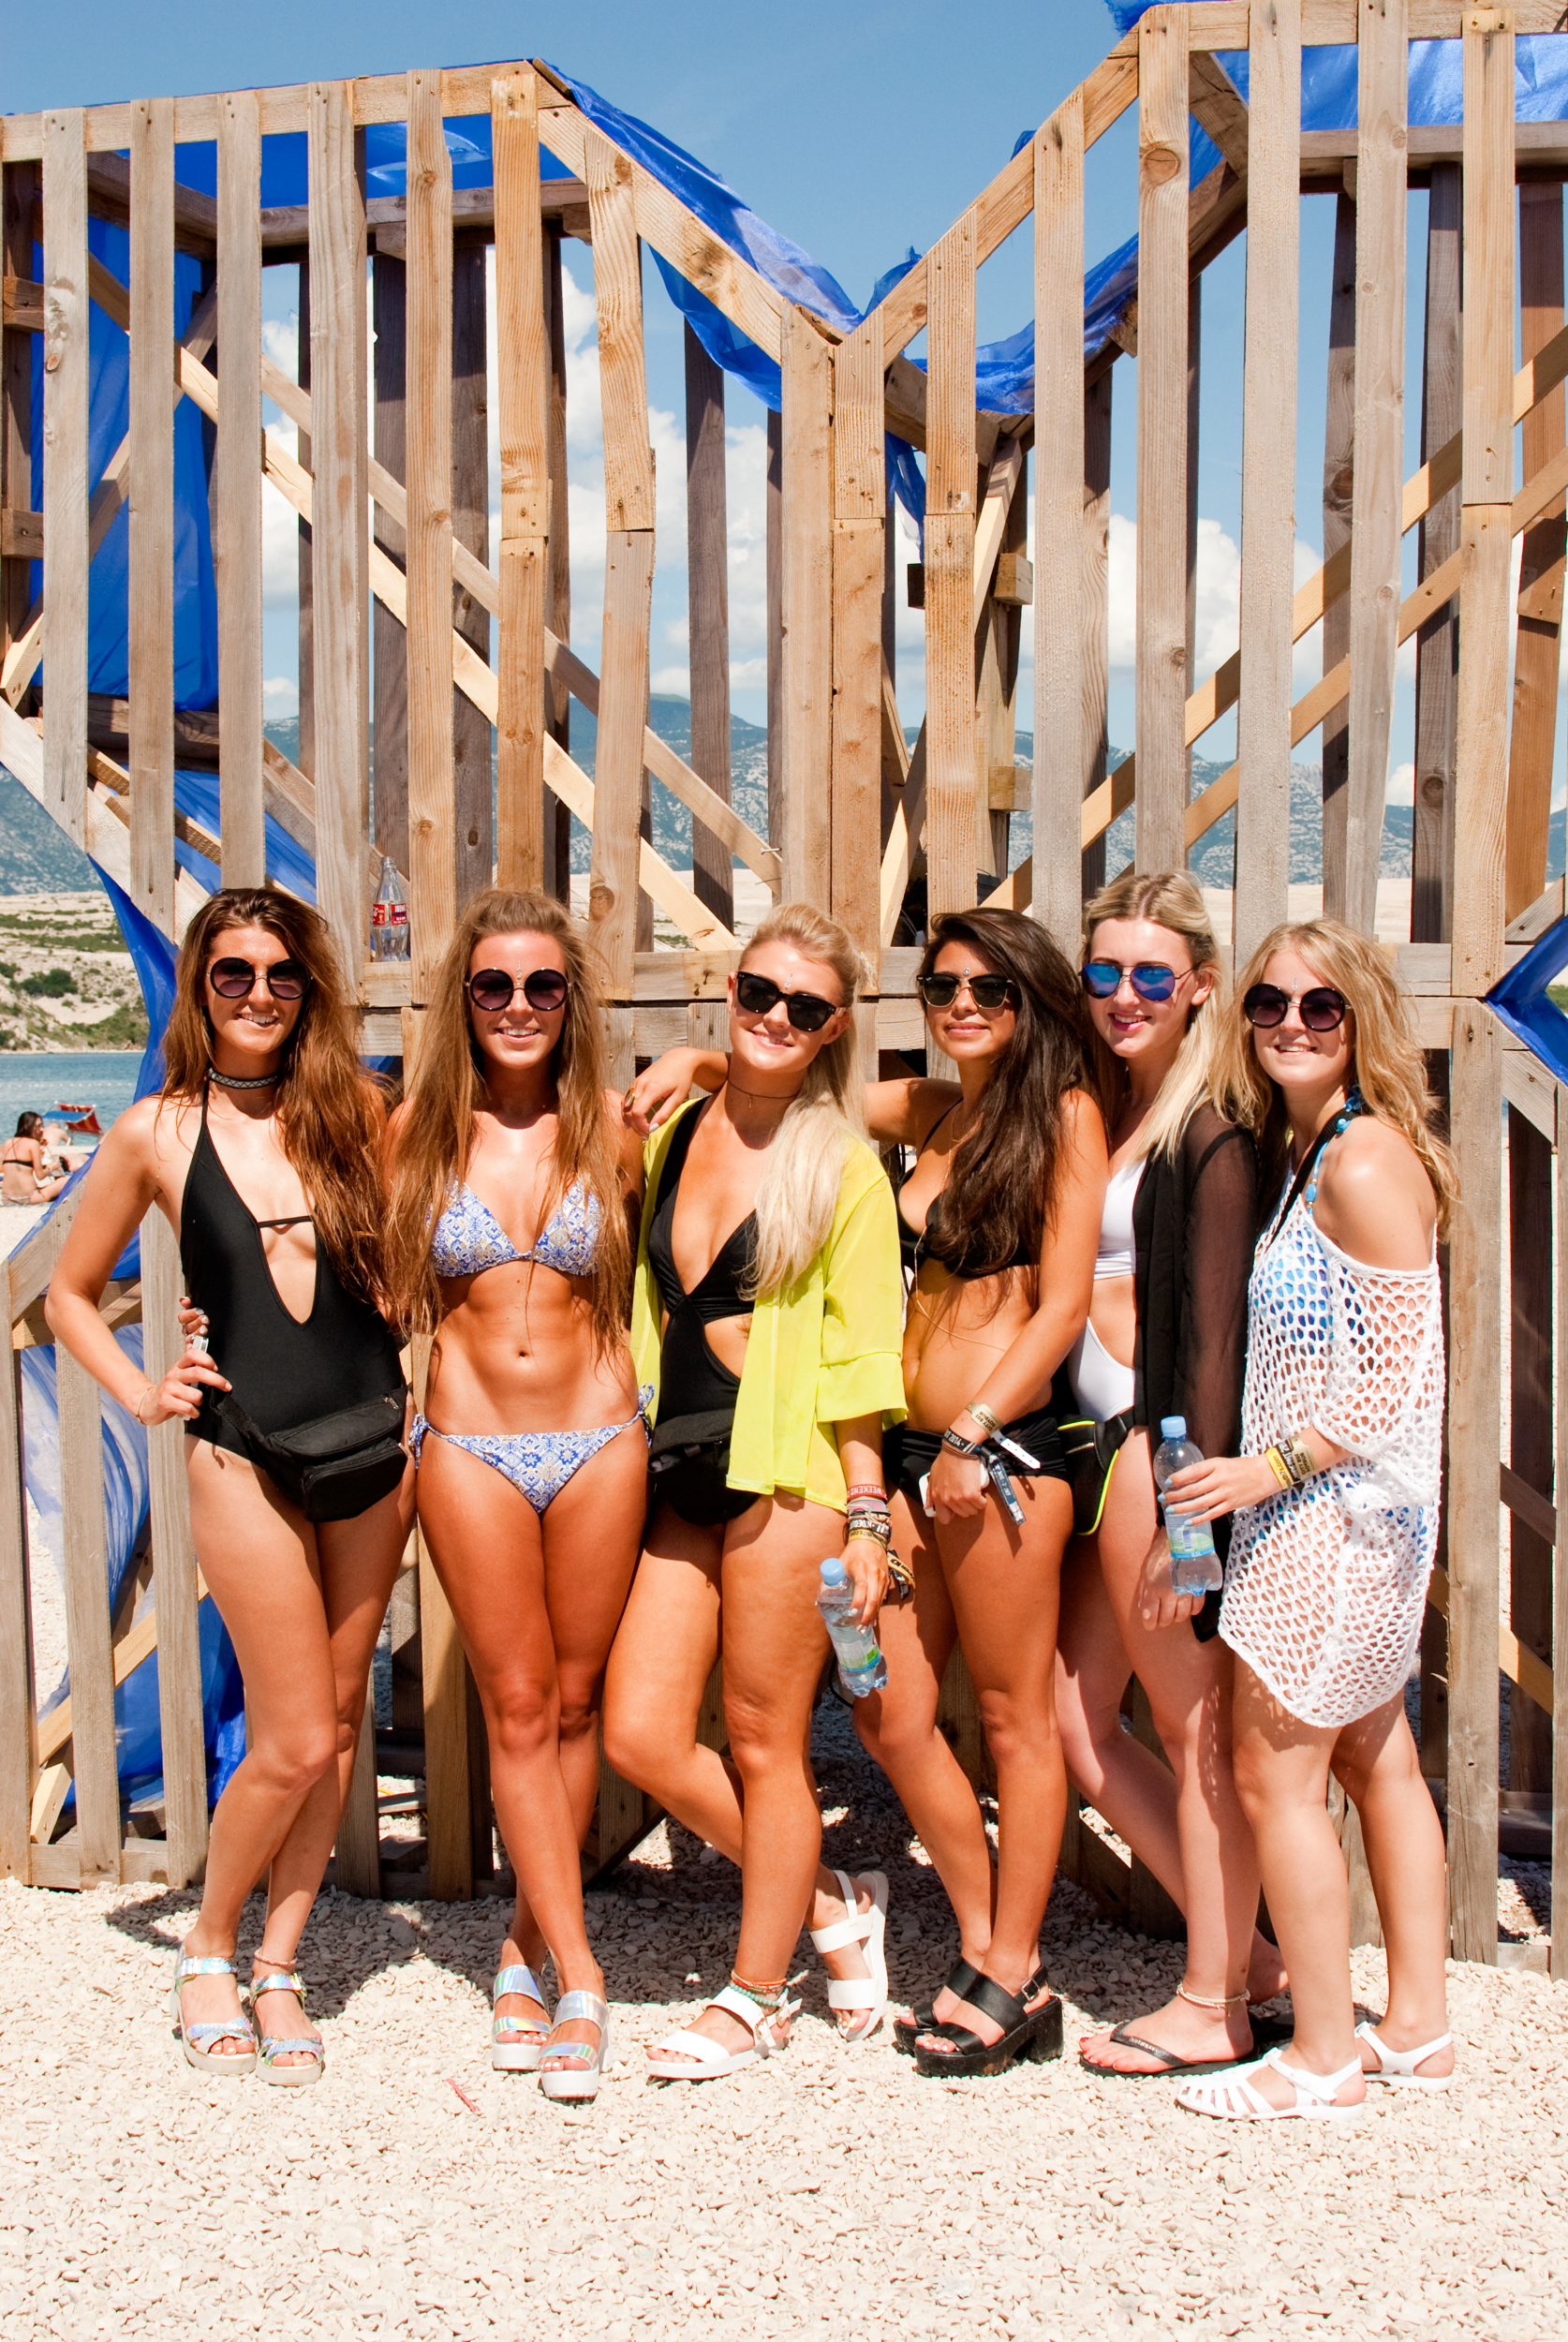 GeorginaCook_hideout_festival_croatia_beach_girls.jpg